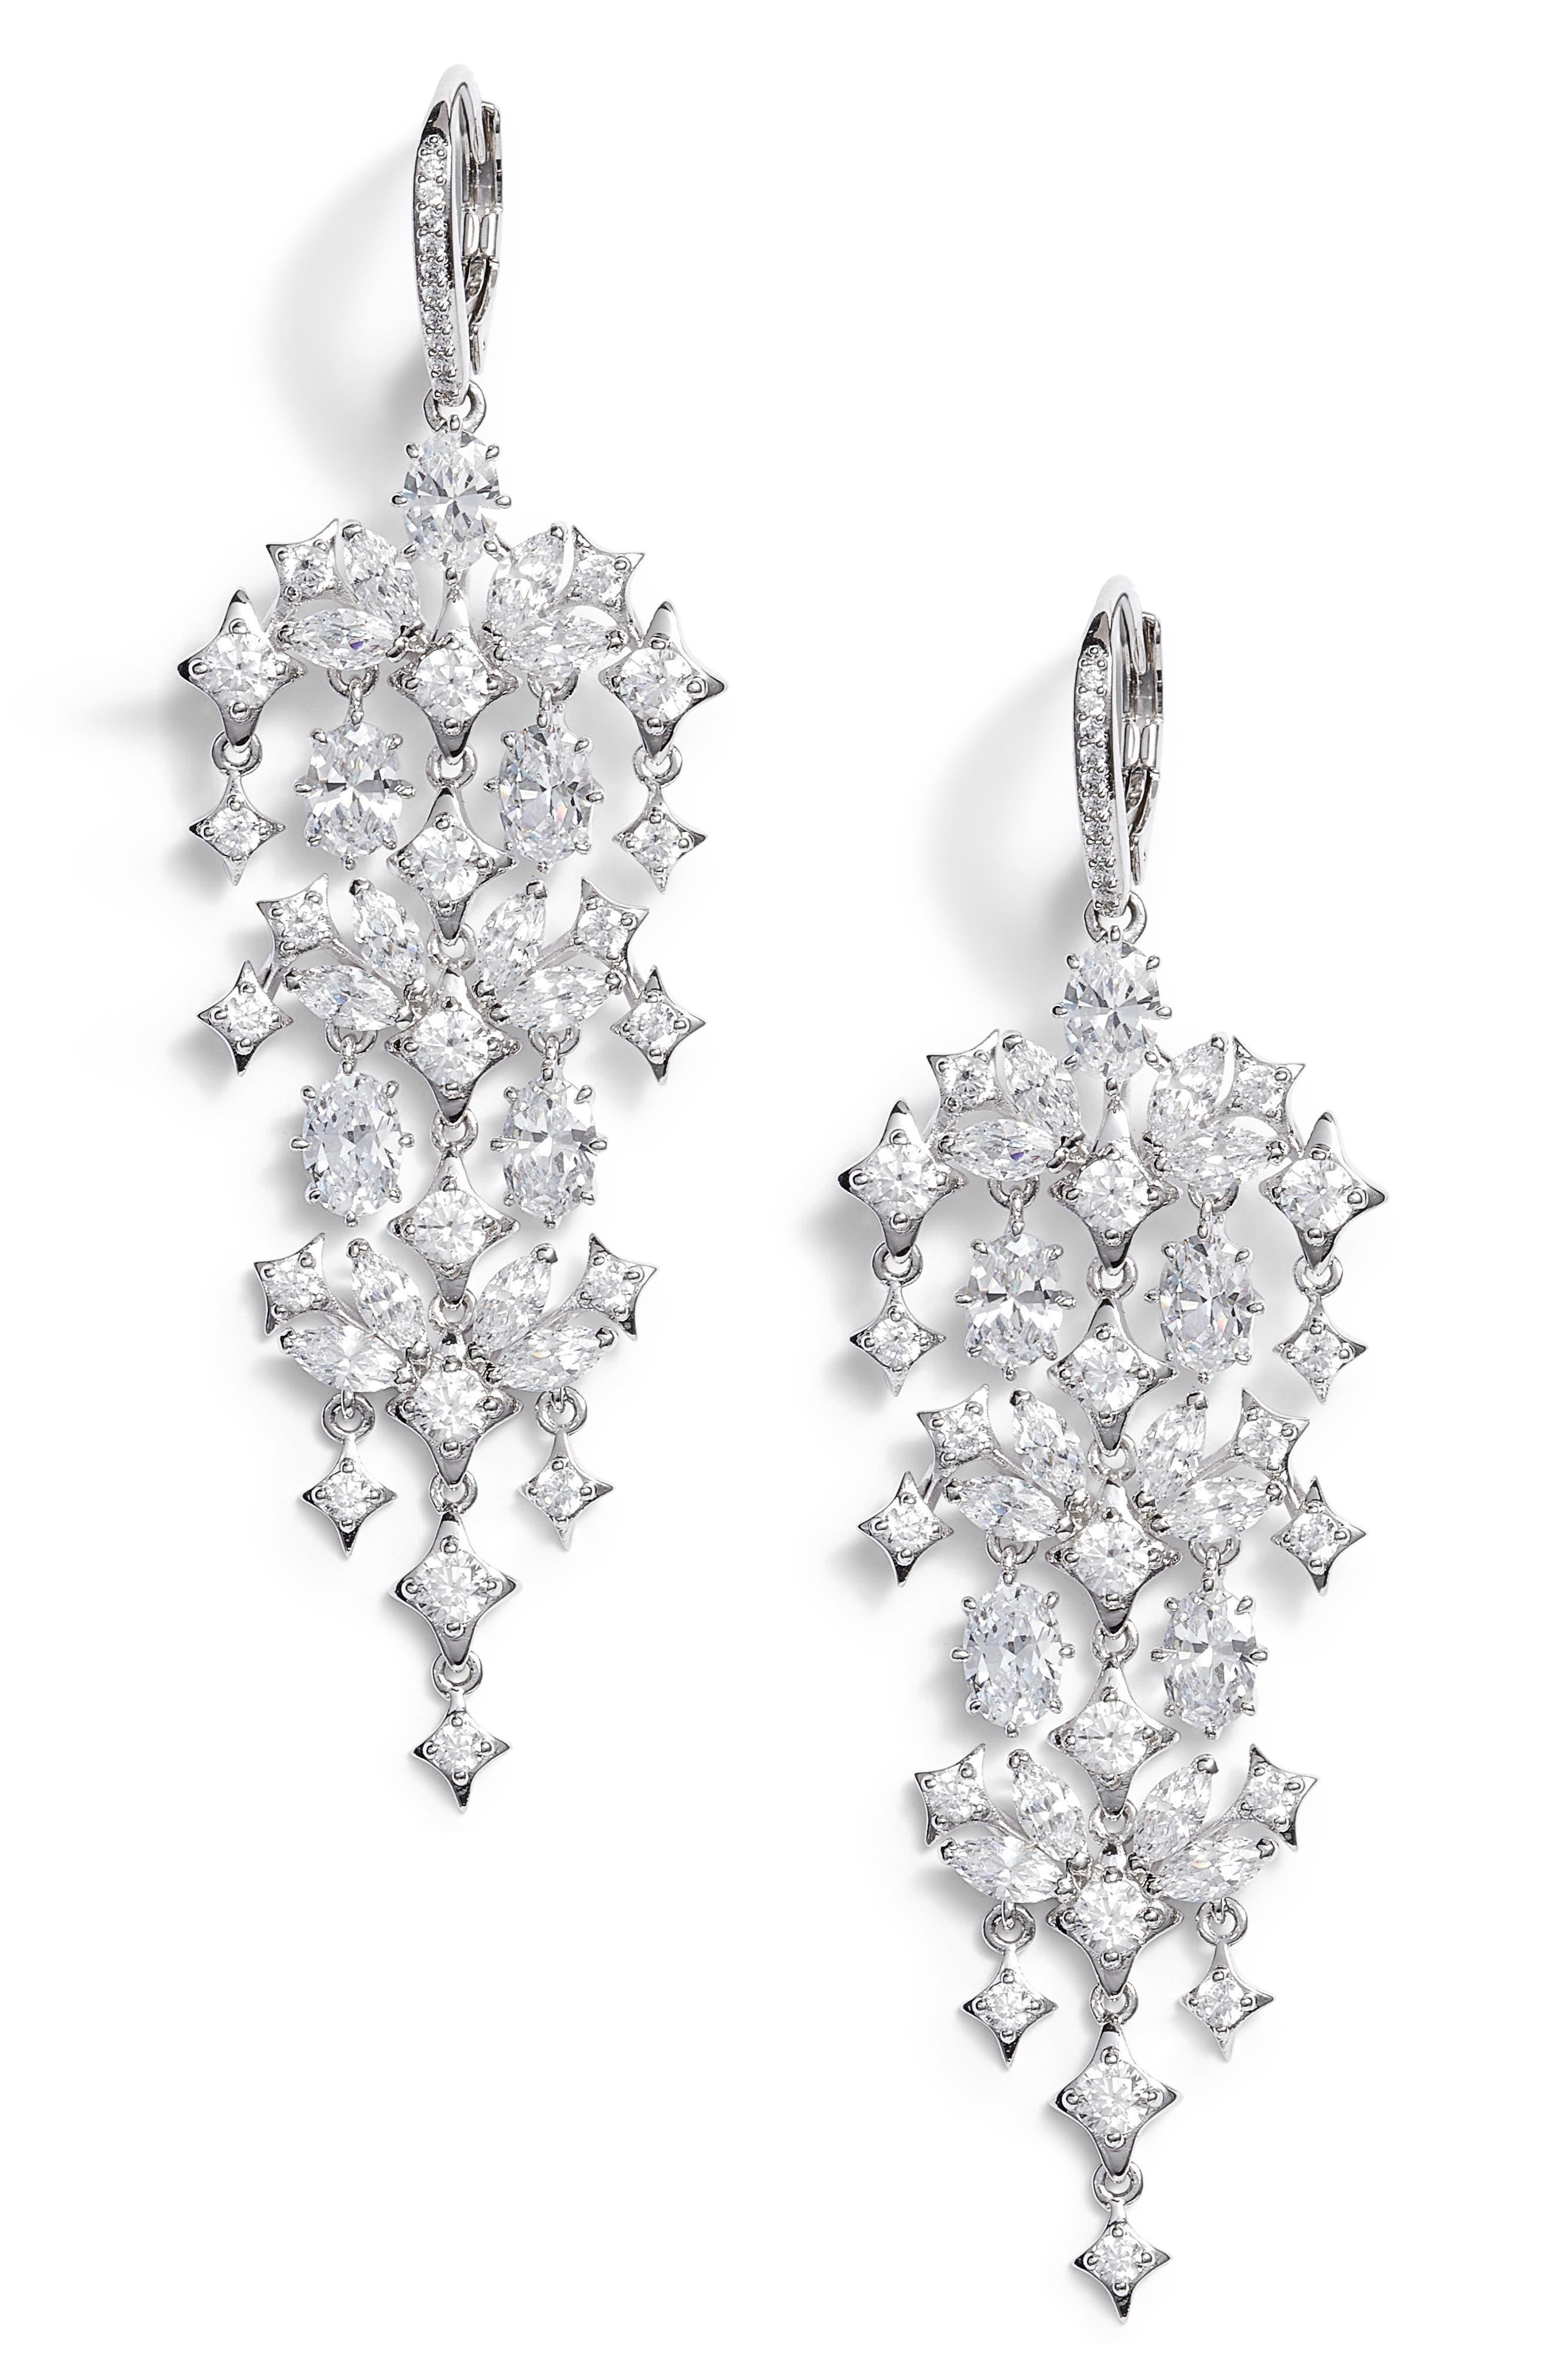 Boho Crystal Chandelier Earrings,                         Main,                         color, Silver/ Clear